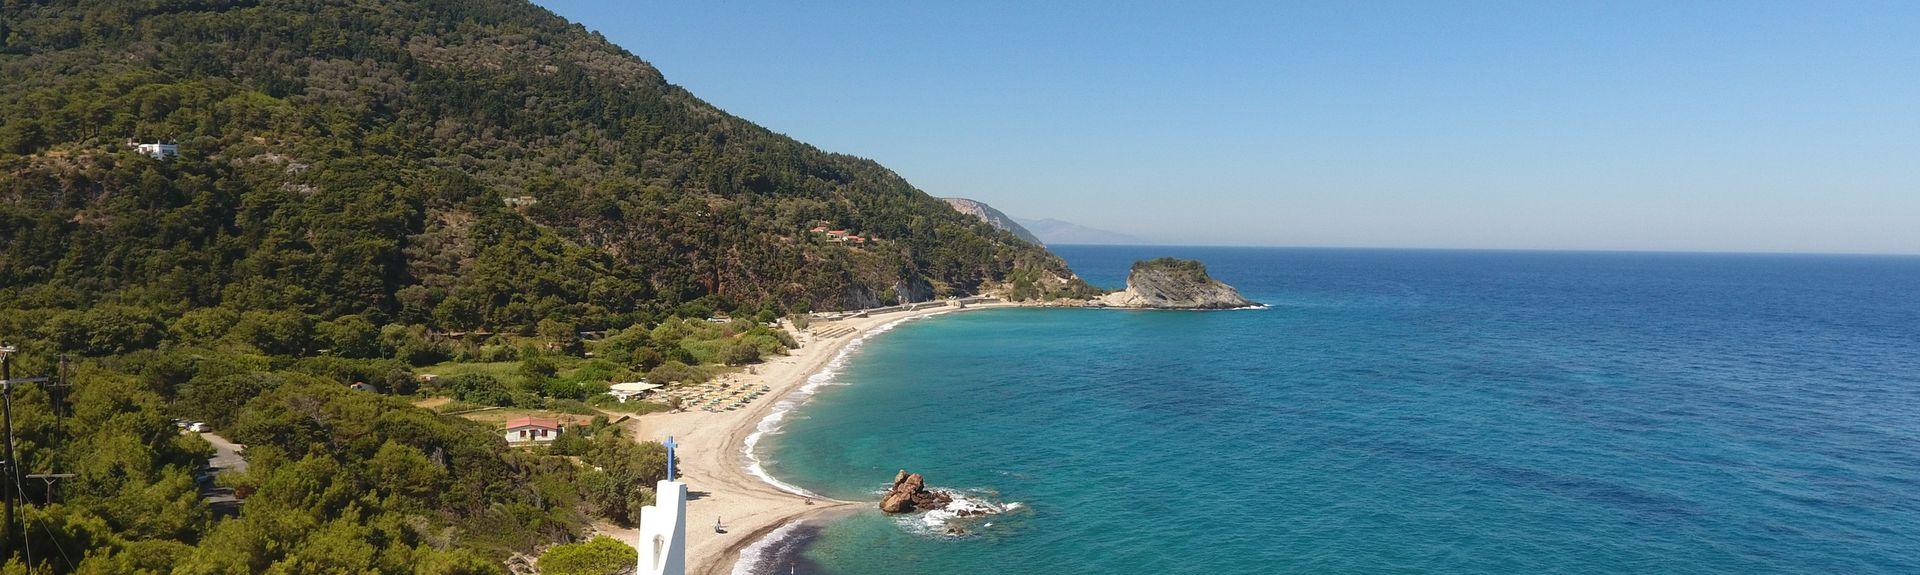 Lemonakia Beach, Samos, Greece